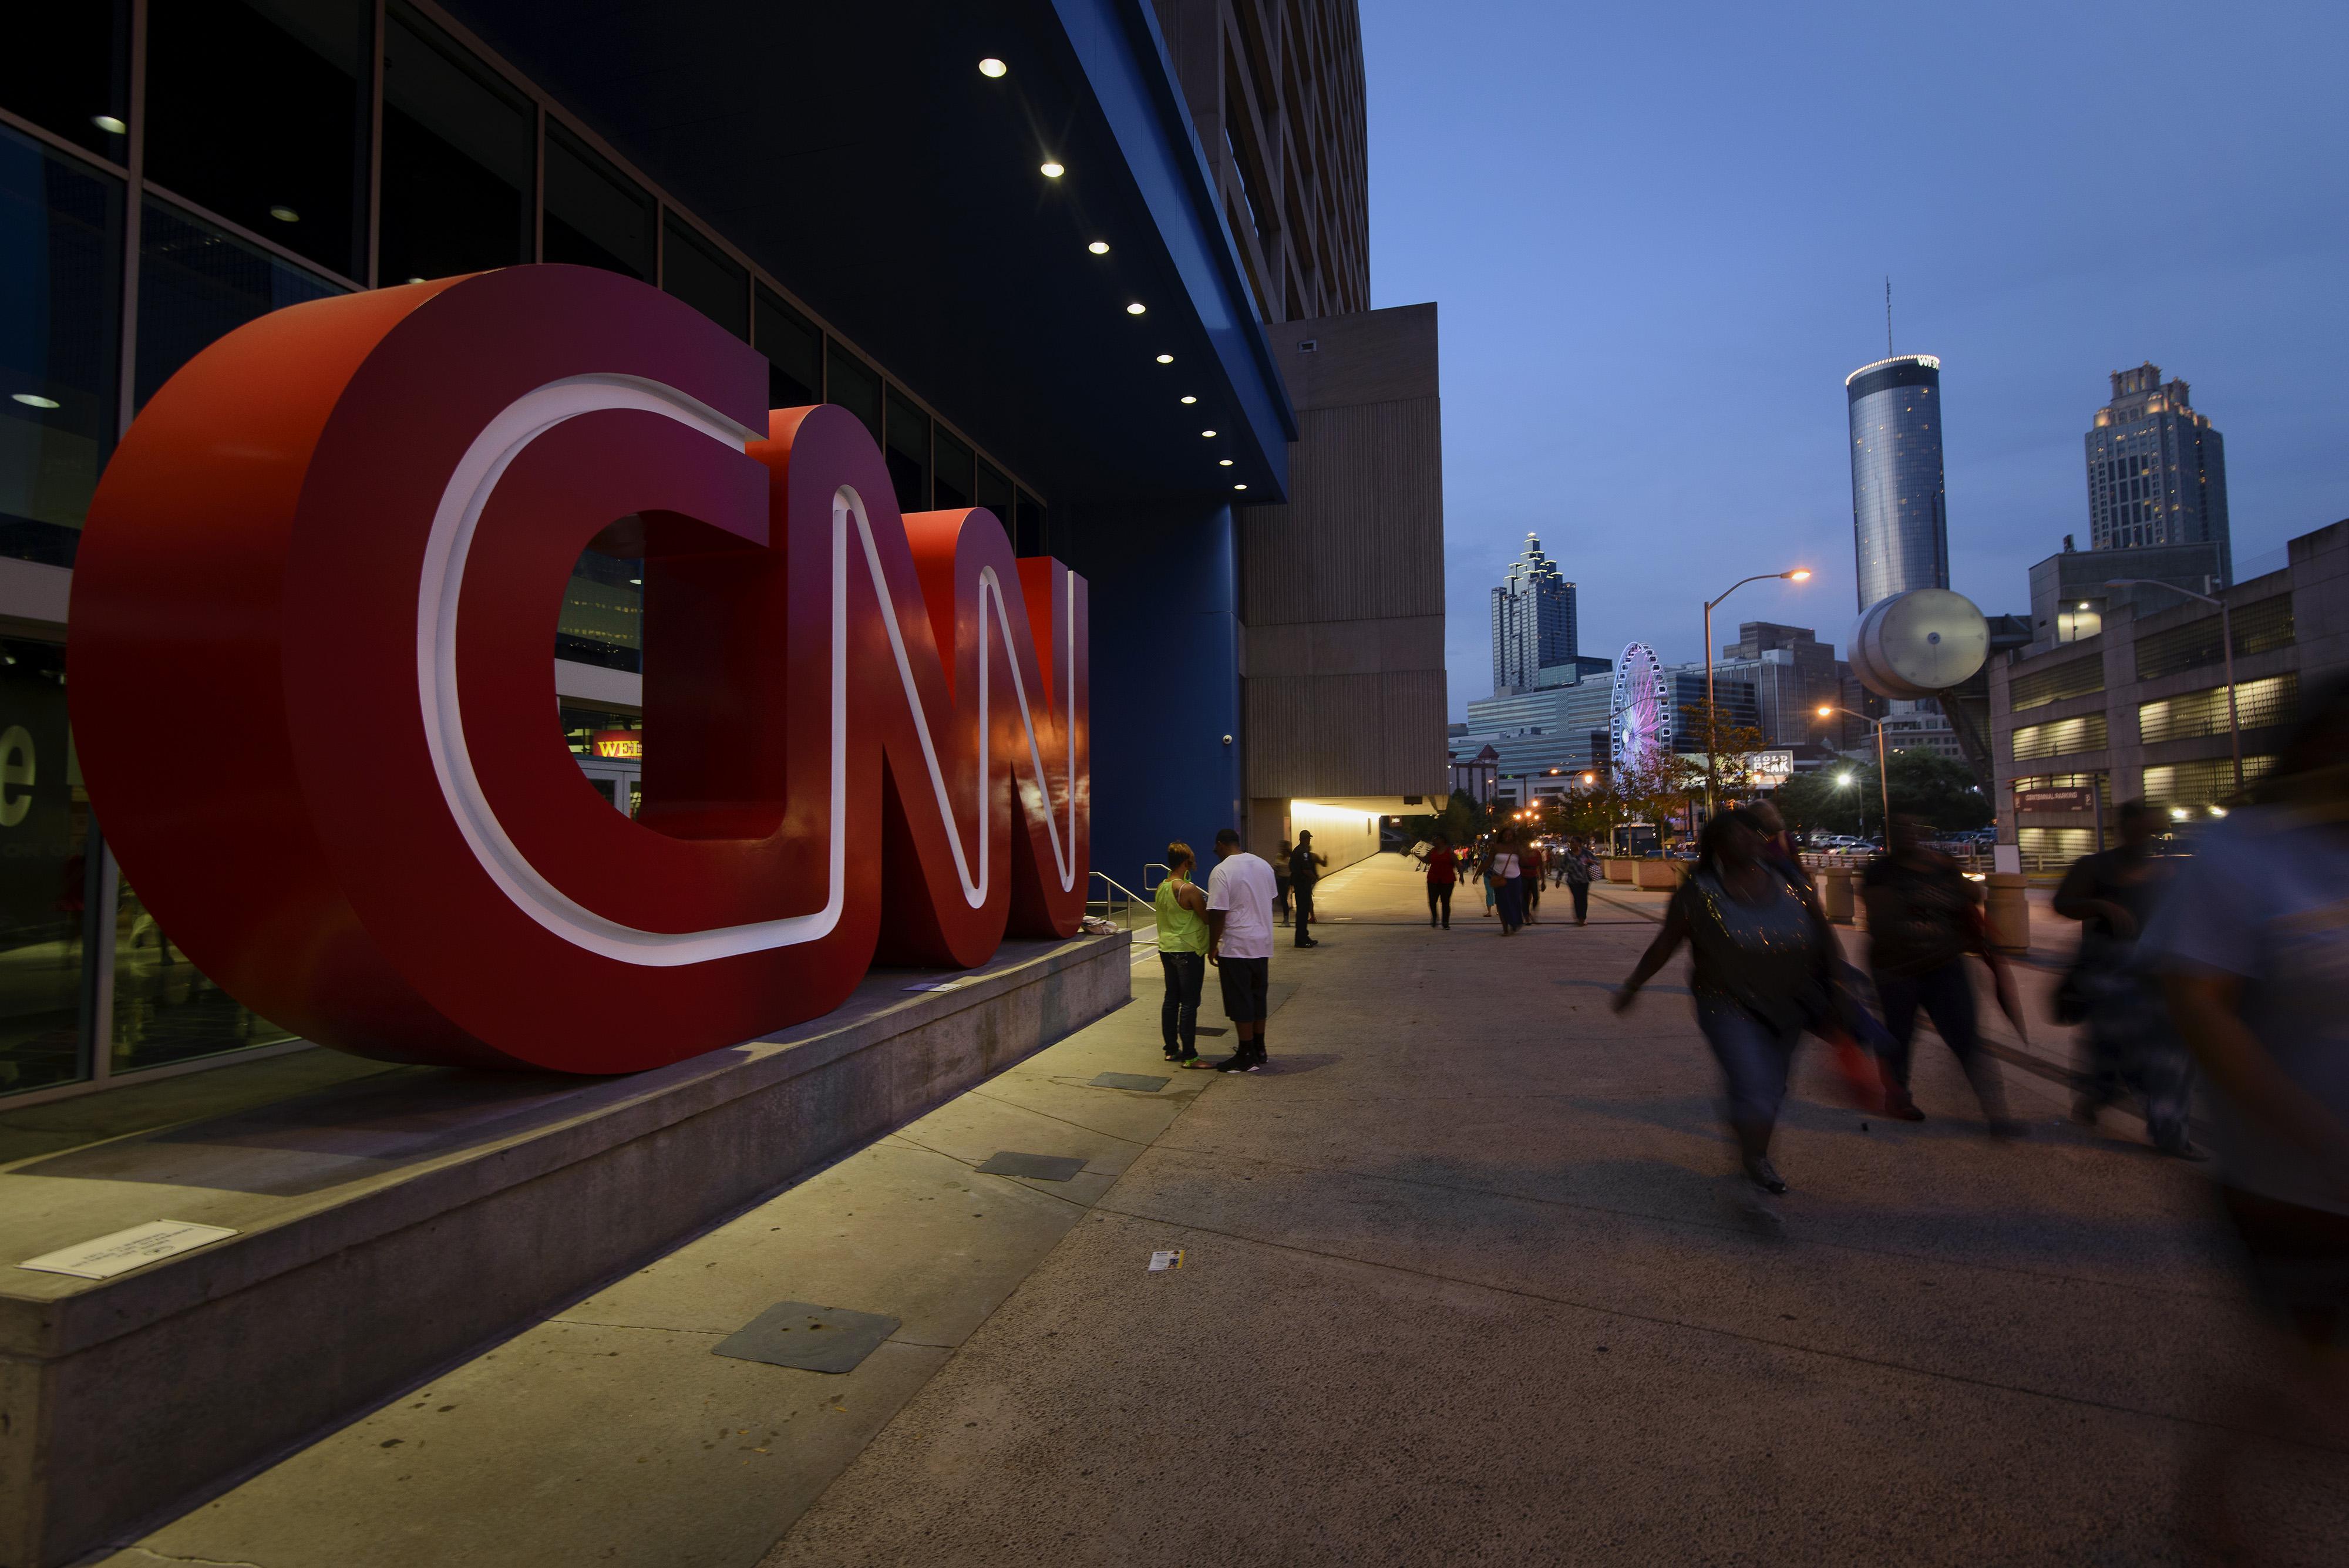 CNN's headquarters building in Atlanta, Georgia, seen on Aug. 2, 2014.